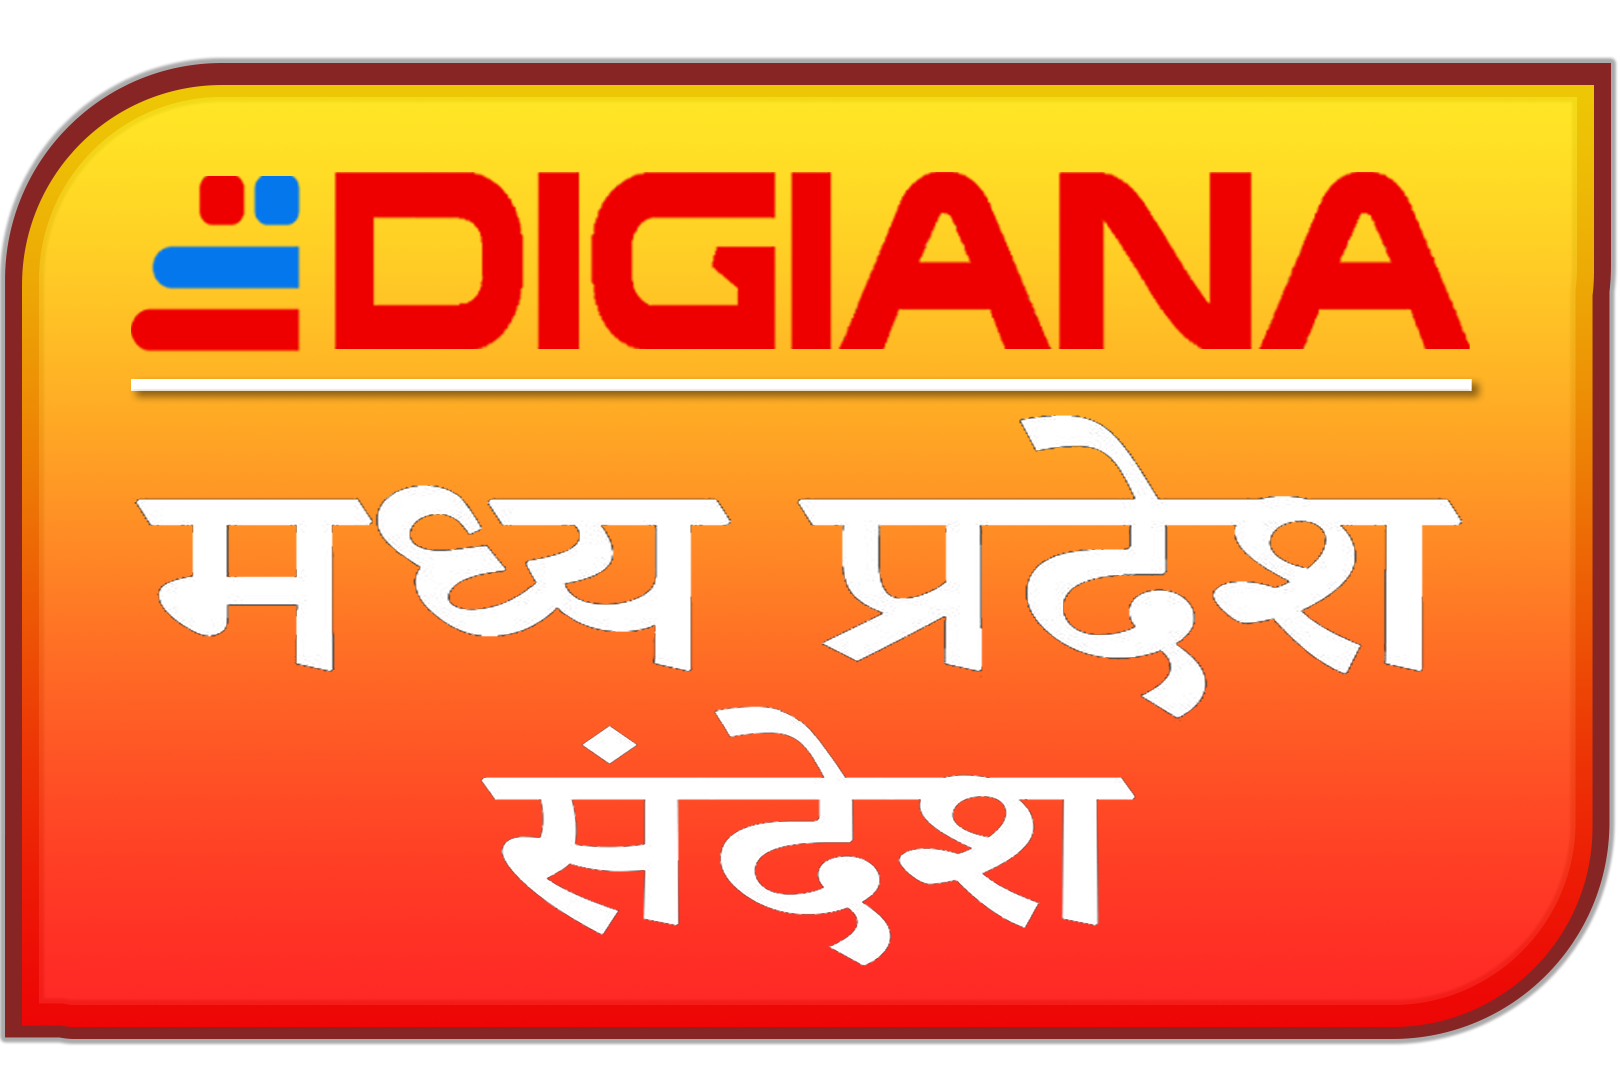 http://digiana.com/assets/uploads/live_tv/20211027151349.png